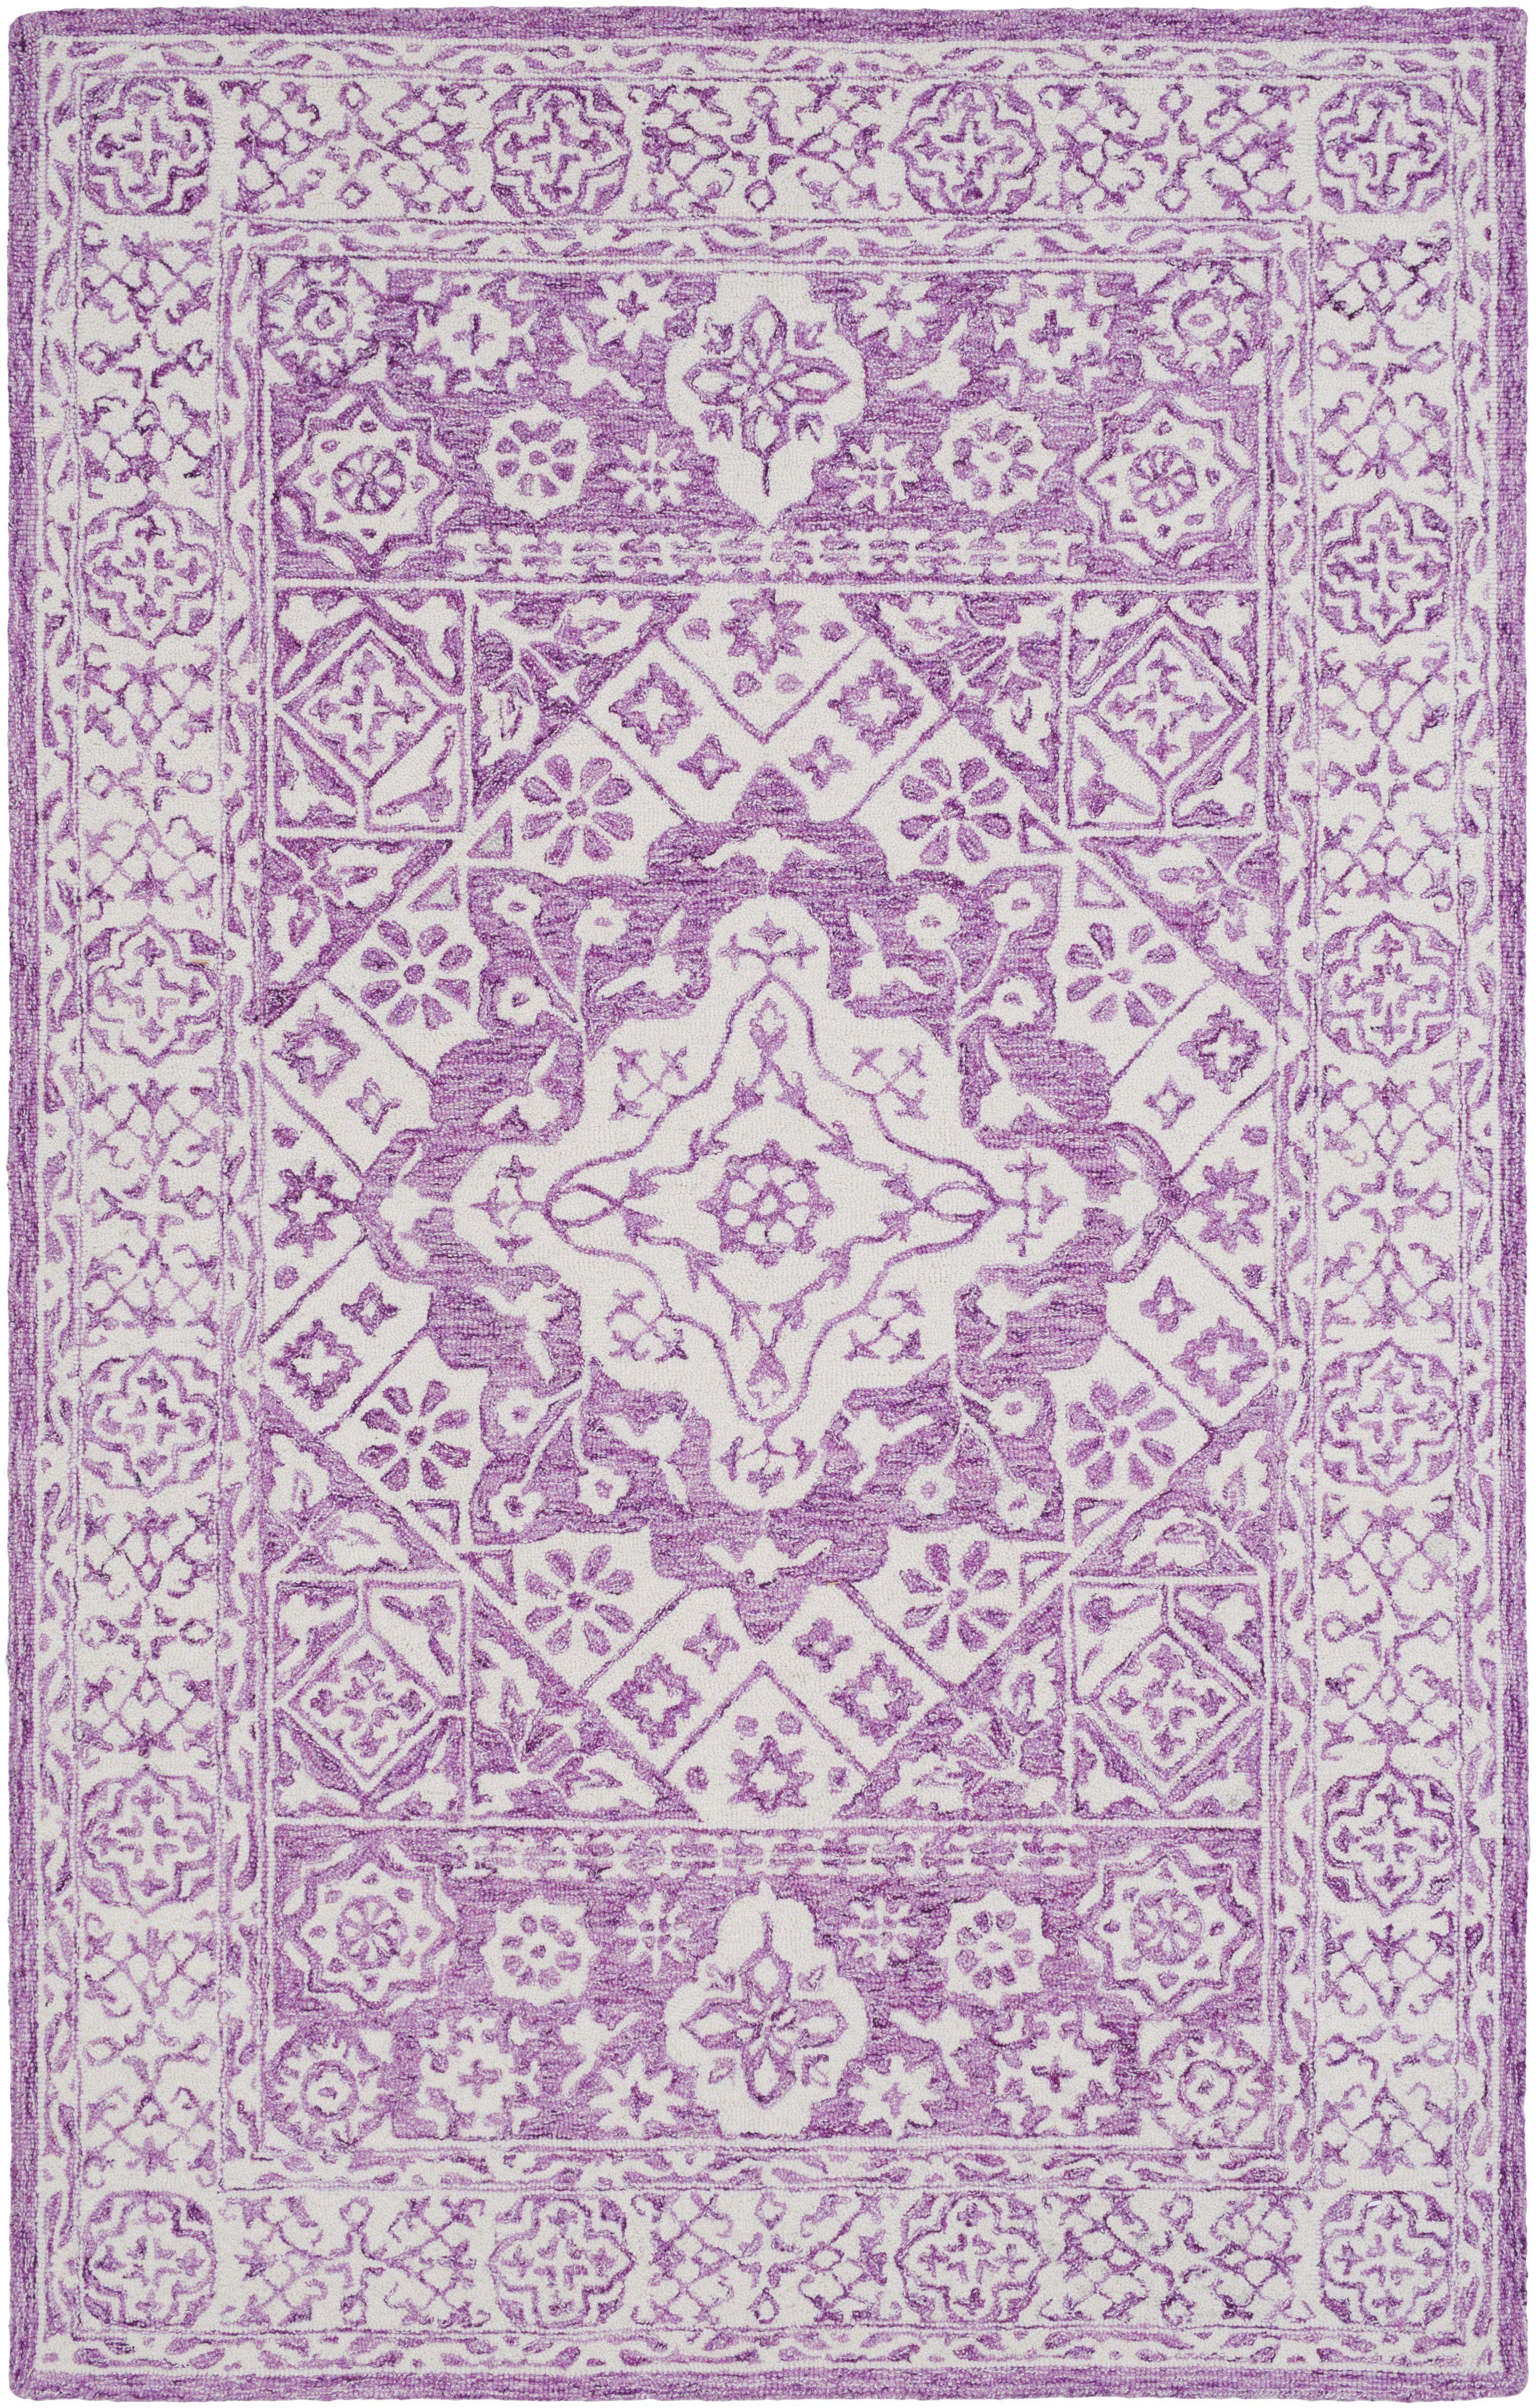 Surya Serafina Clic Purple Srf 2022 Area Rug